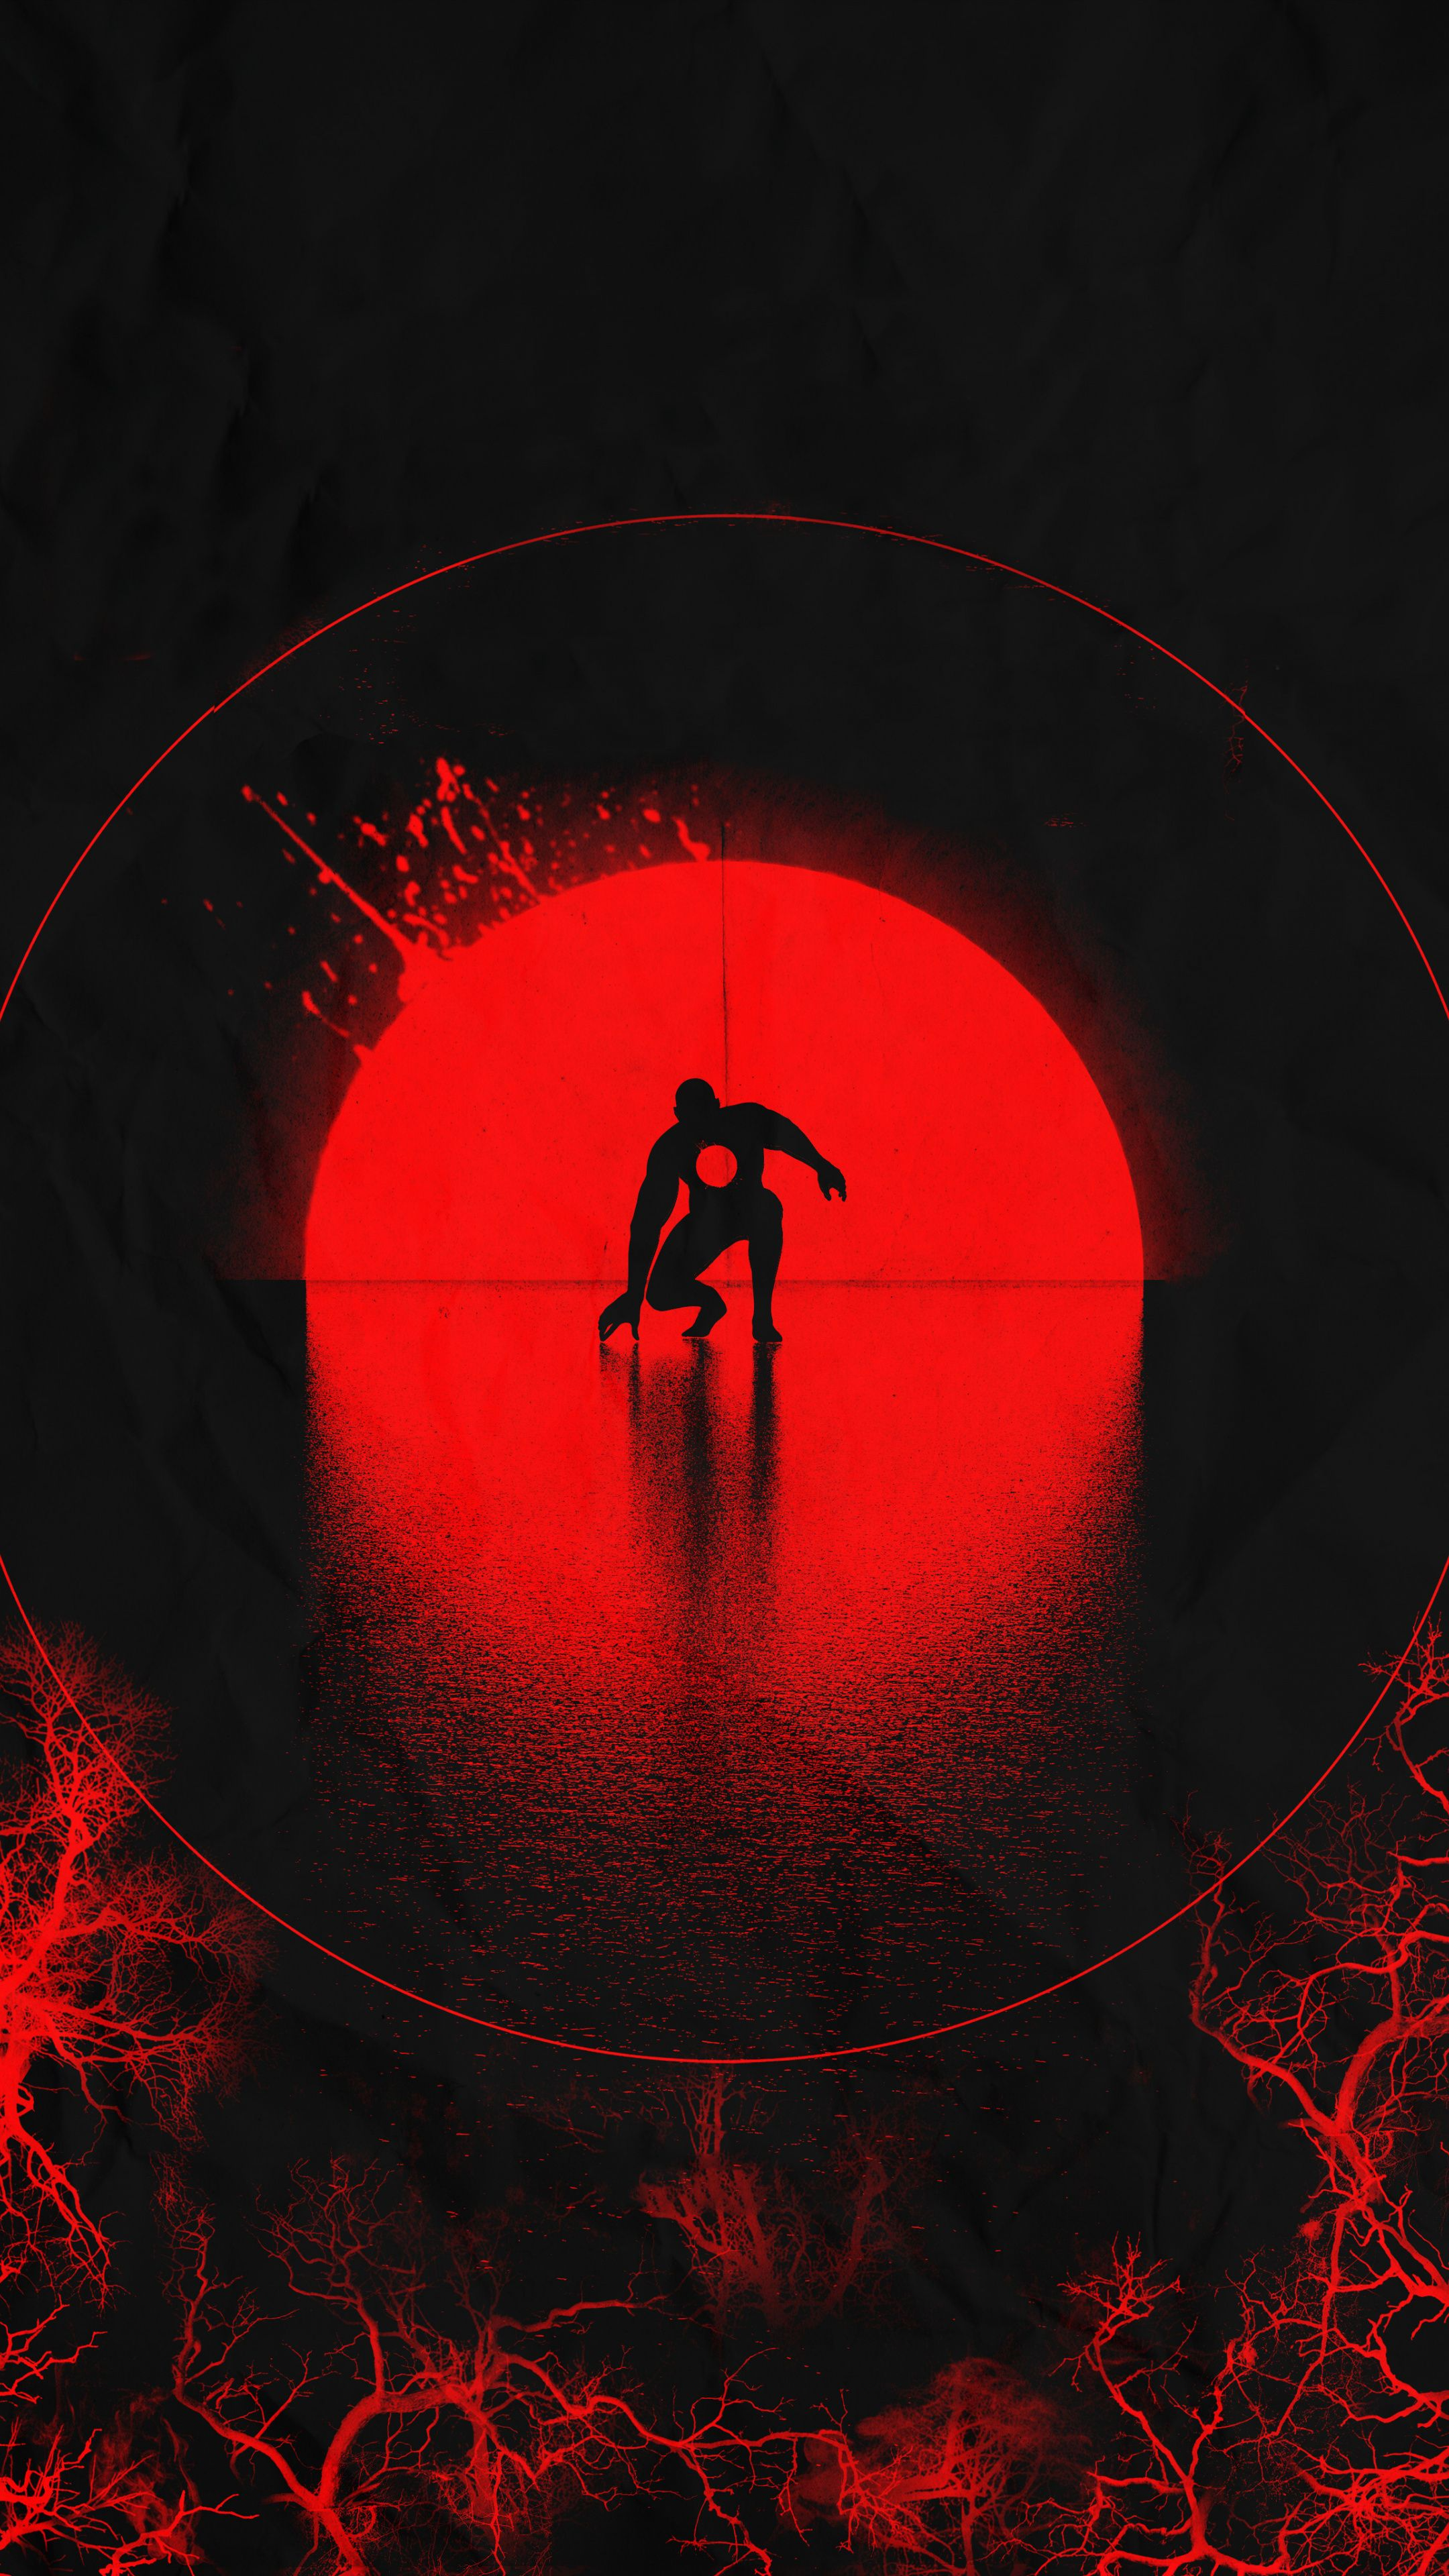 2160x3840 Bloodshot movie 2020 minimal art wallpaper in 2020 2160x3840